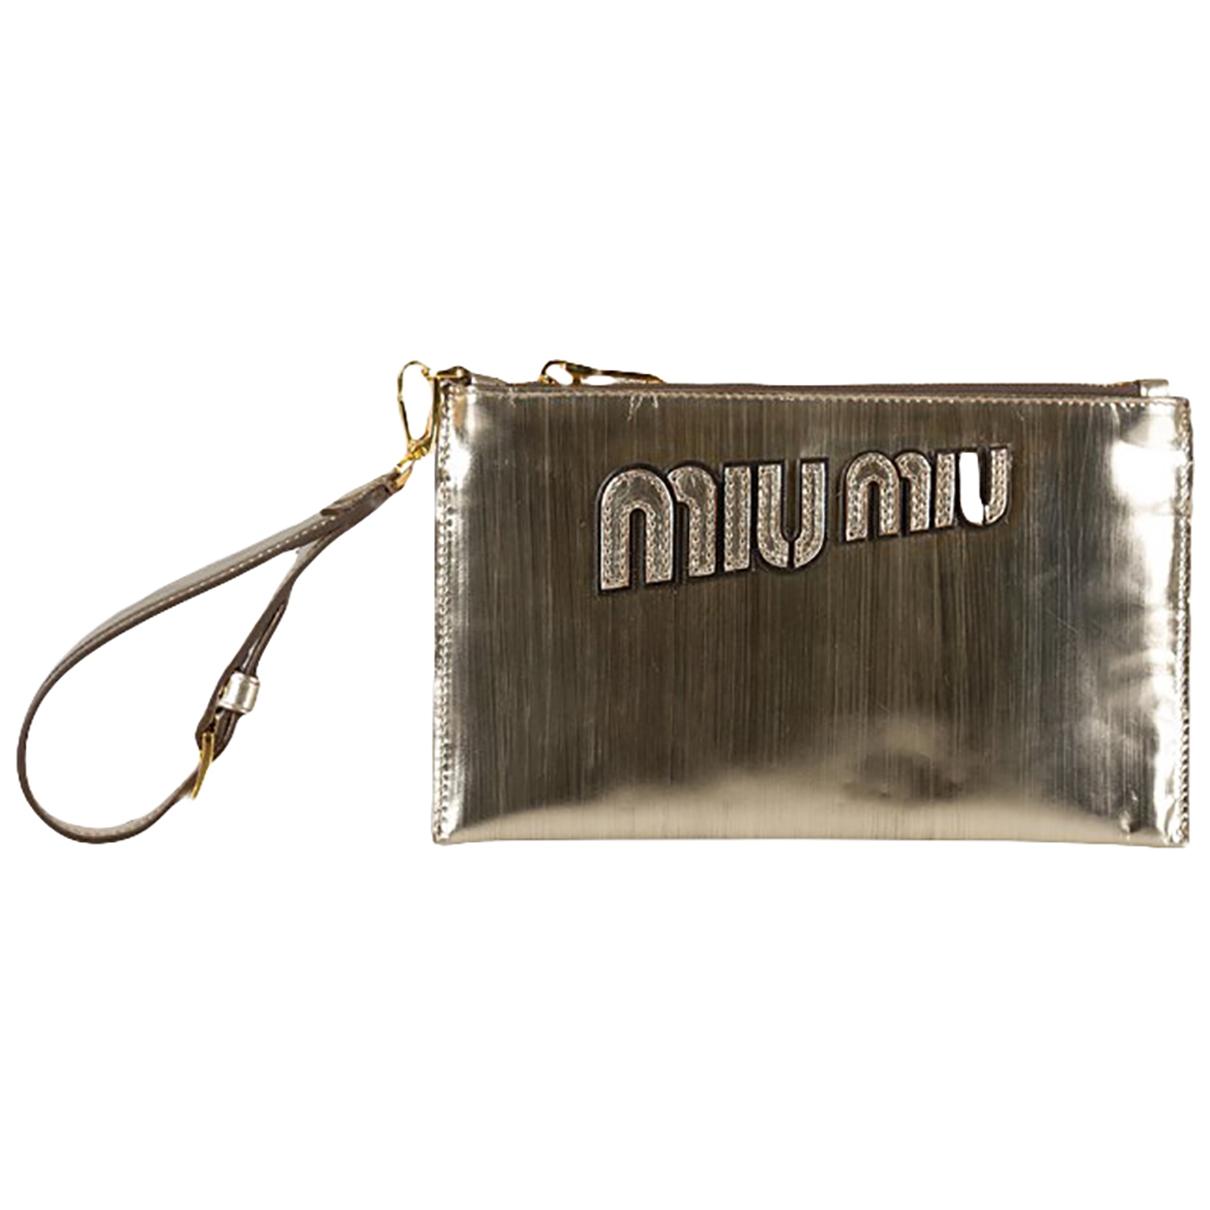 Miu Miu \N Metallic Patent leather Clutch bag for Women \N